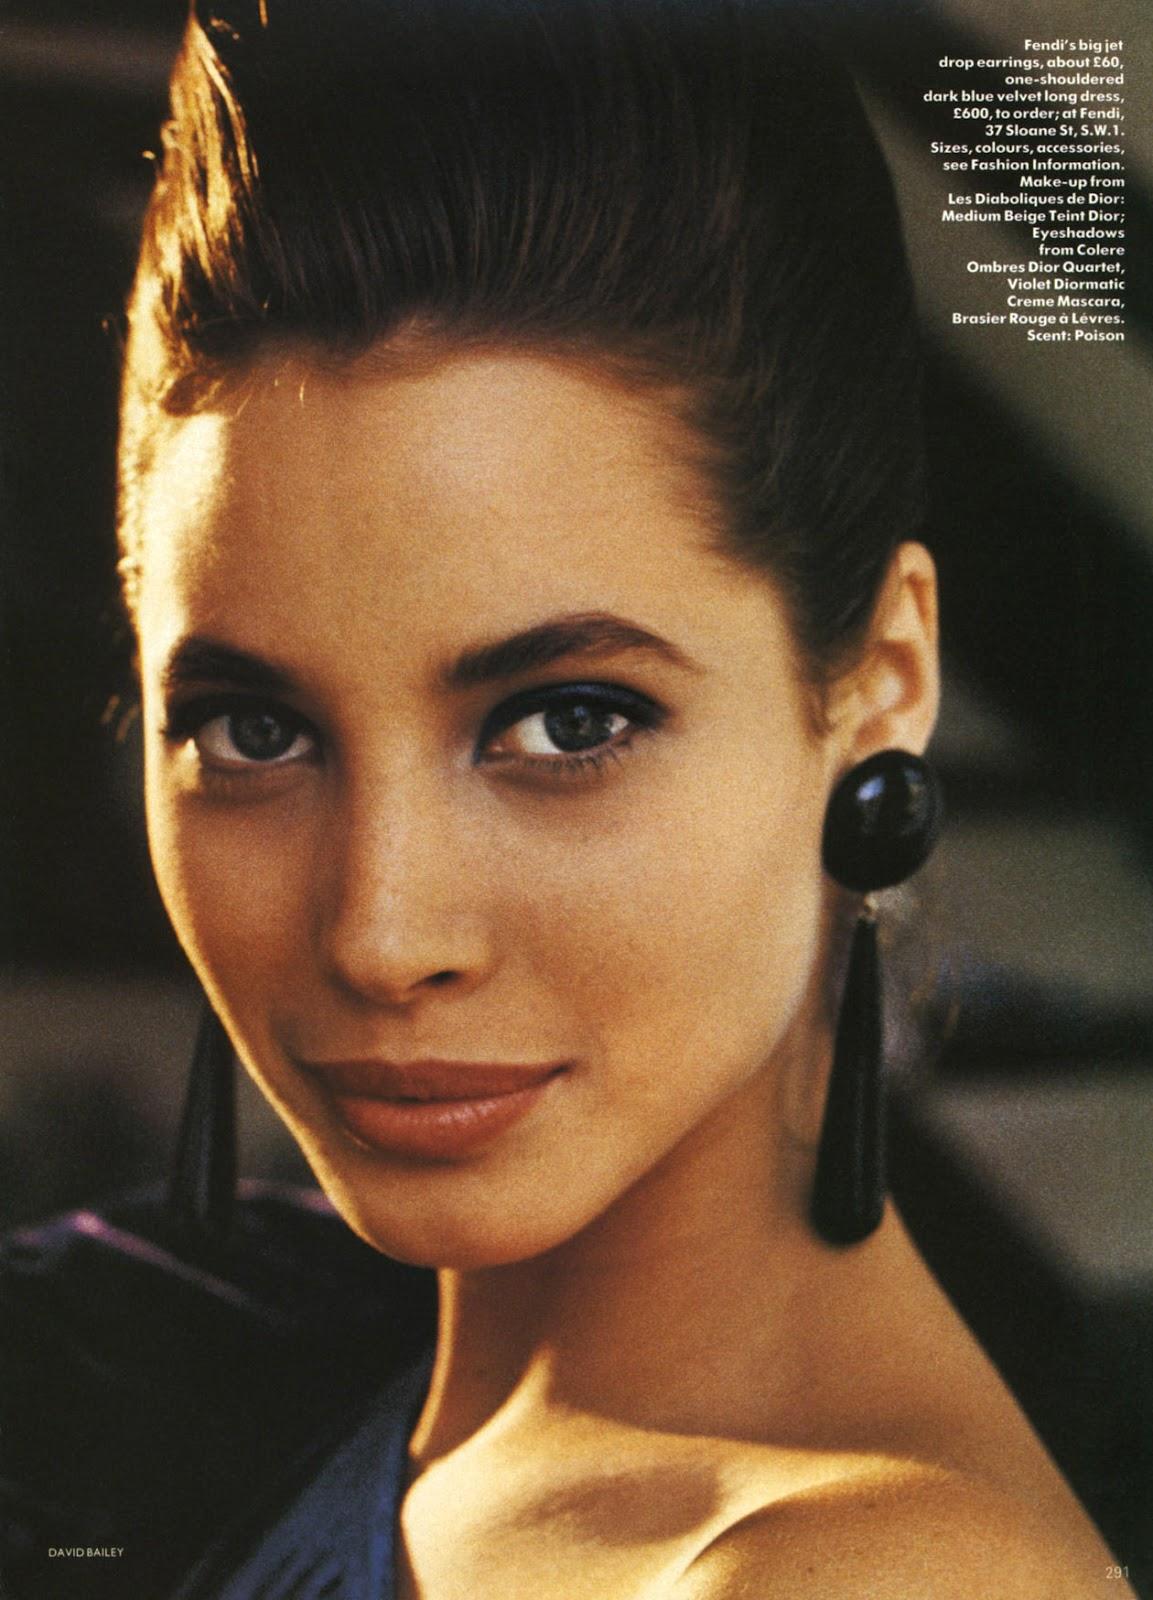 http://2.bp.blogspot.com/-Jdt91tlv-0o/T_GpQV-cldI/AAAAAAAAHvI/BfeCcKqN6JQ/s1600/Christy+Turlington+Uk+Vogue+1987+David+Baliley+2.jpg